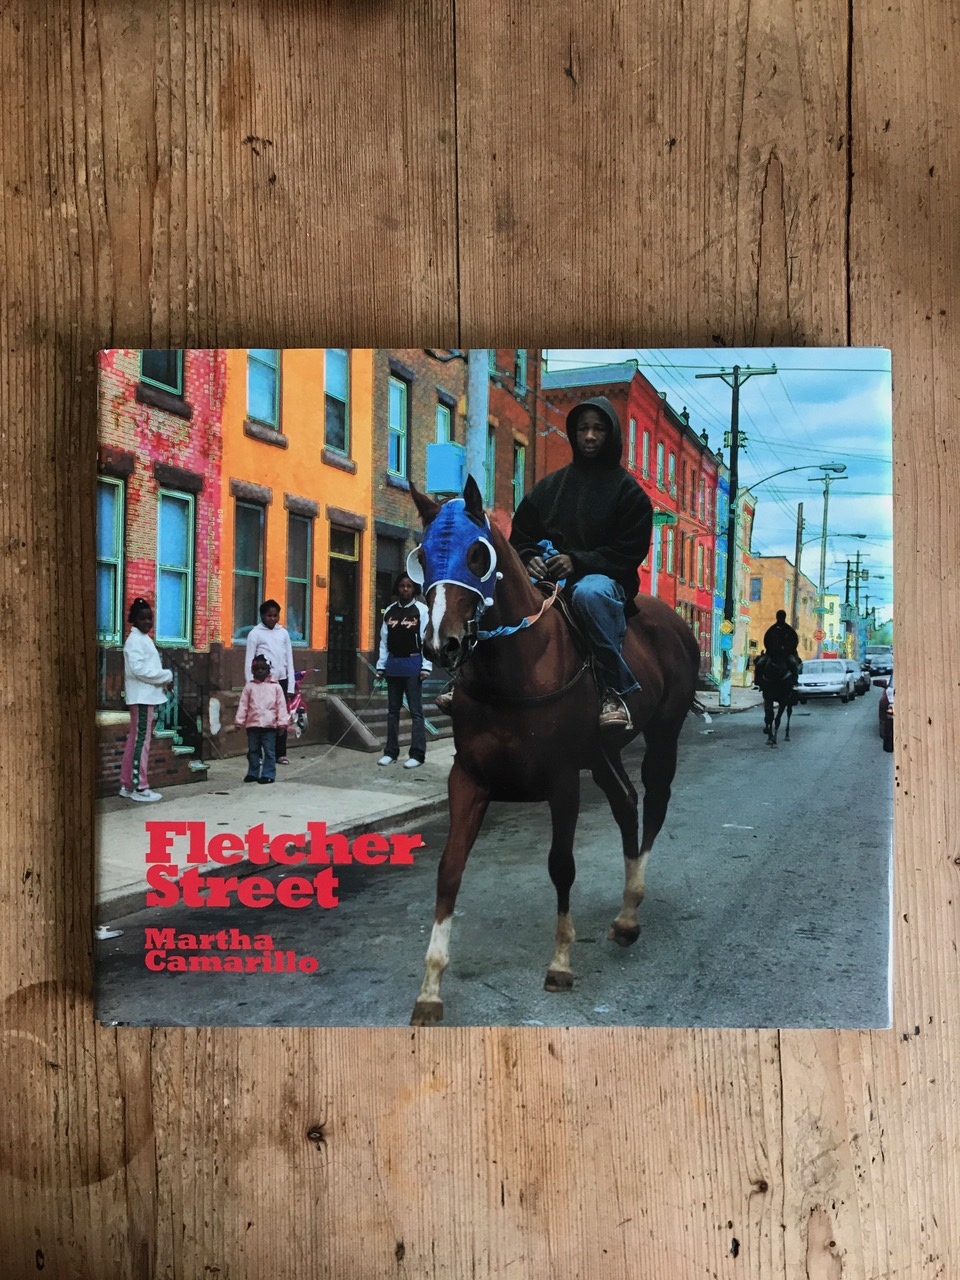 Film and Art Director Arnaud Bresson selects Fletcher Street by Martha Camarillo